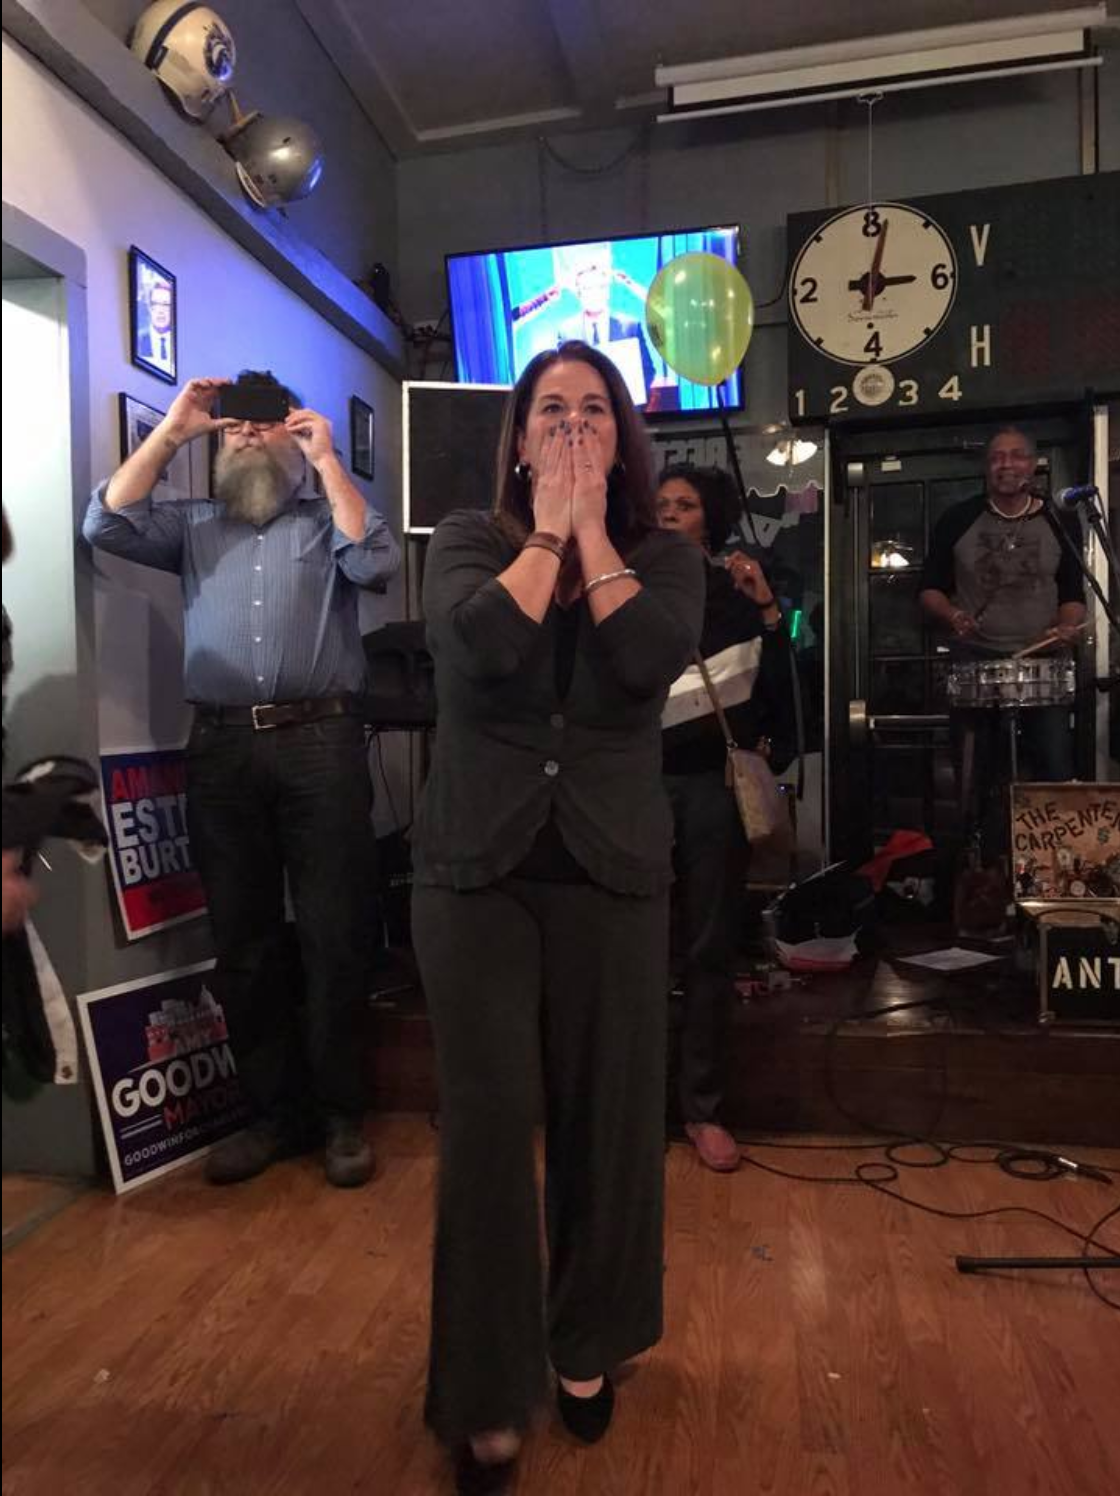 Amy Goodwin wins Charleston Mayor Race